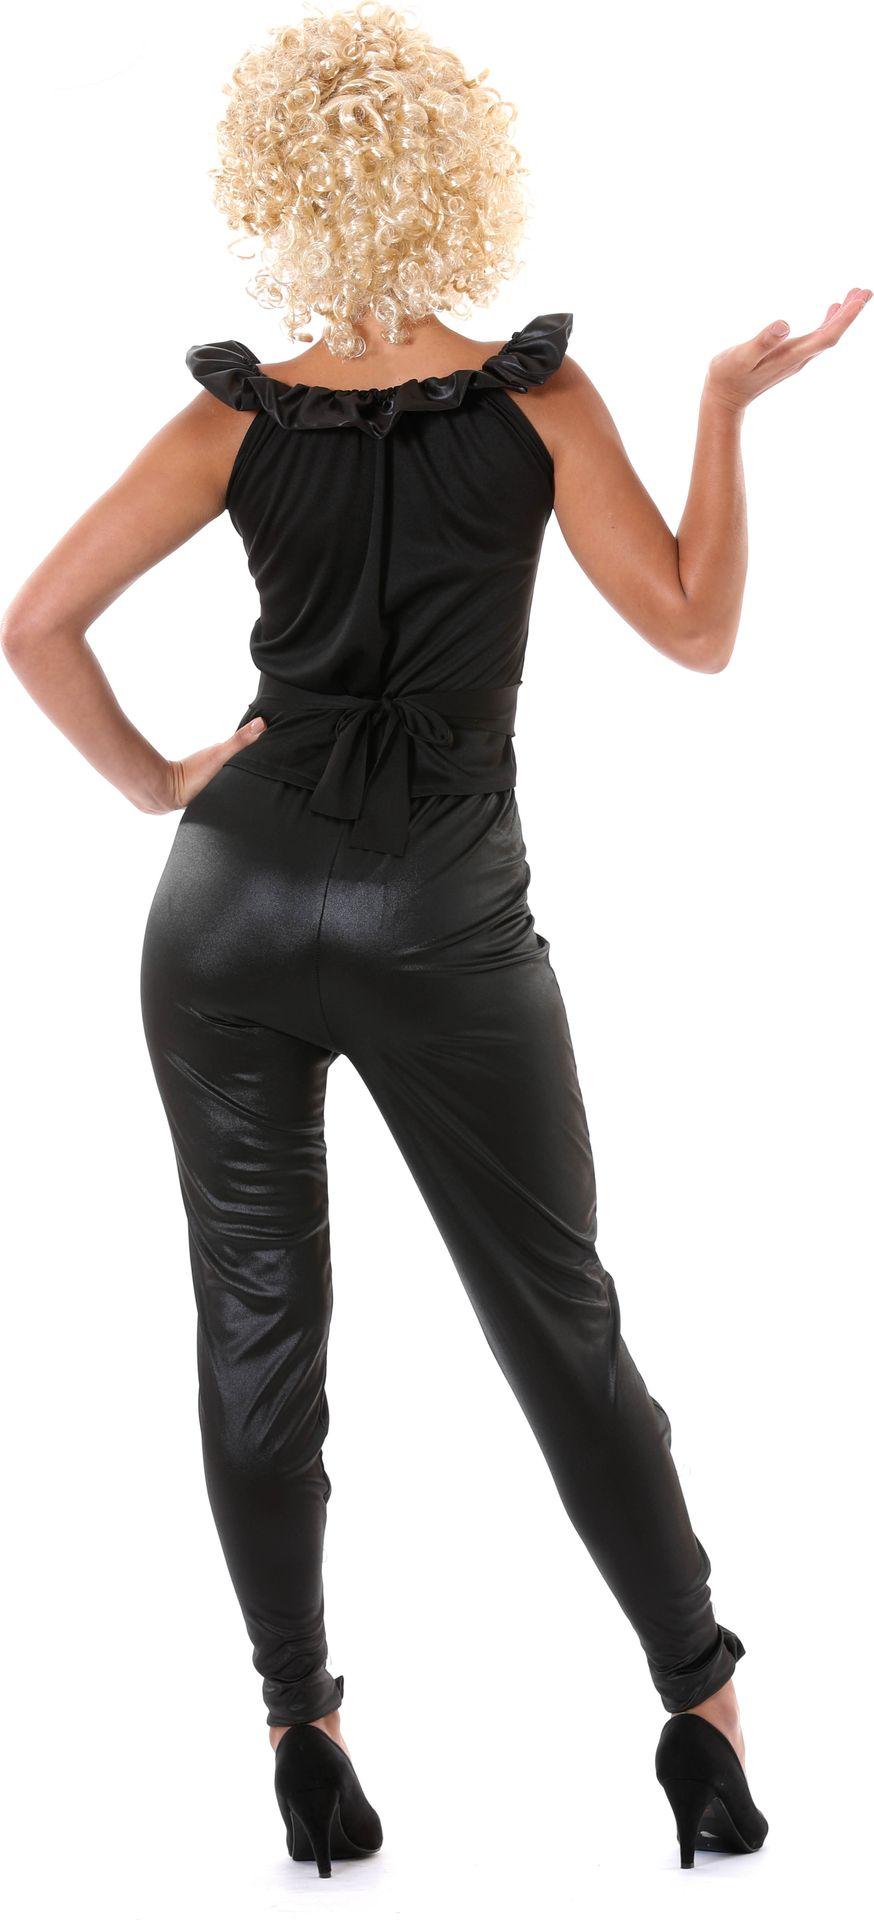 Zeer Sandy Grease outfit   Carnavalskleding.nl @HM08